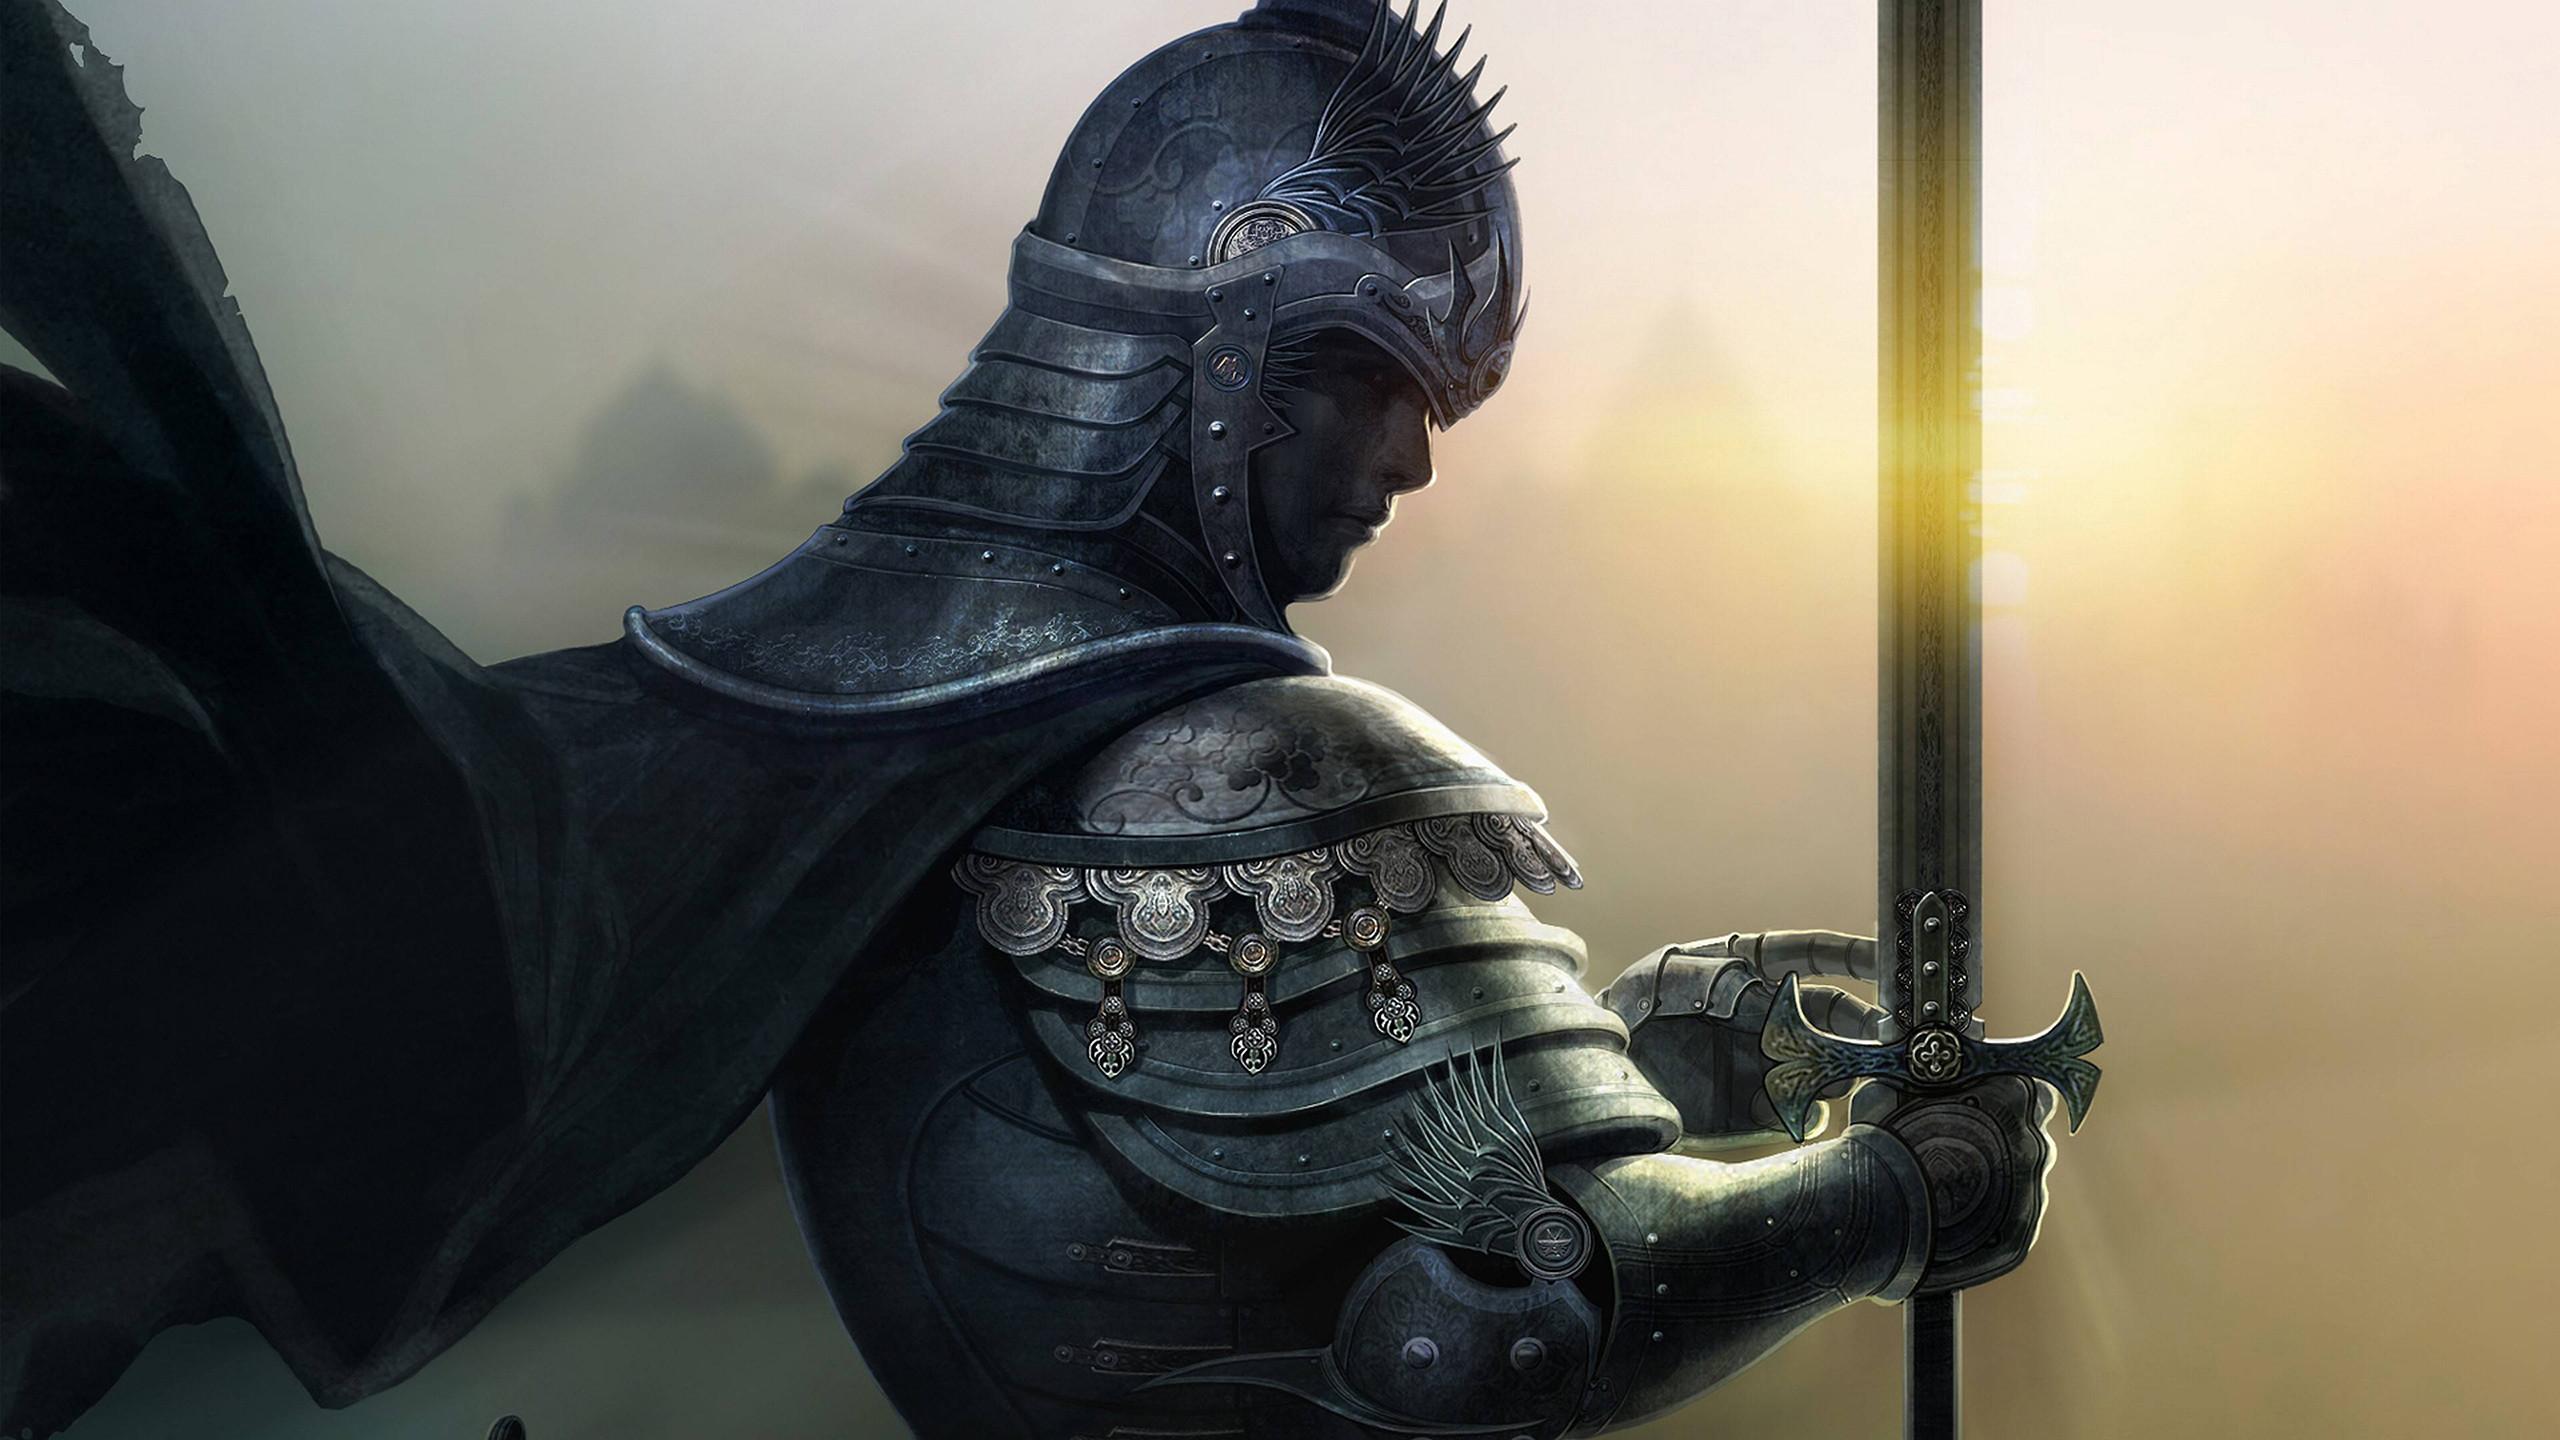 Medieval Armor Knight Sword HD wallpaper thumb